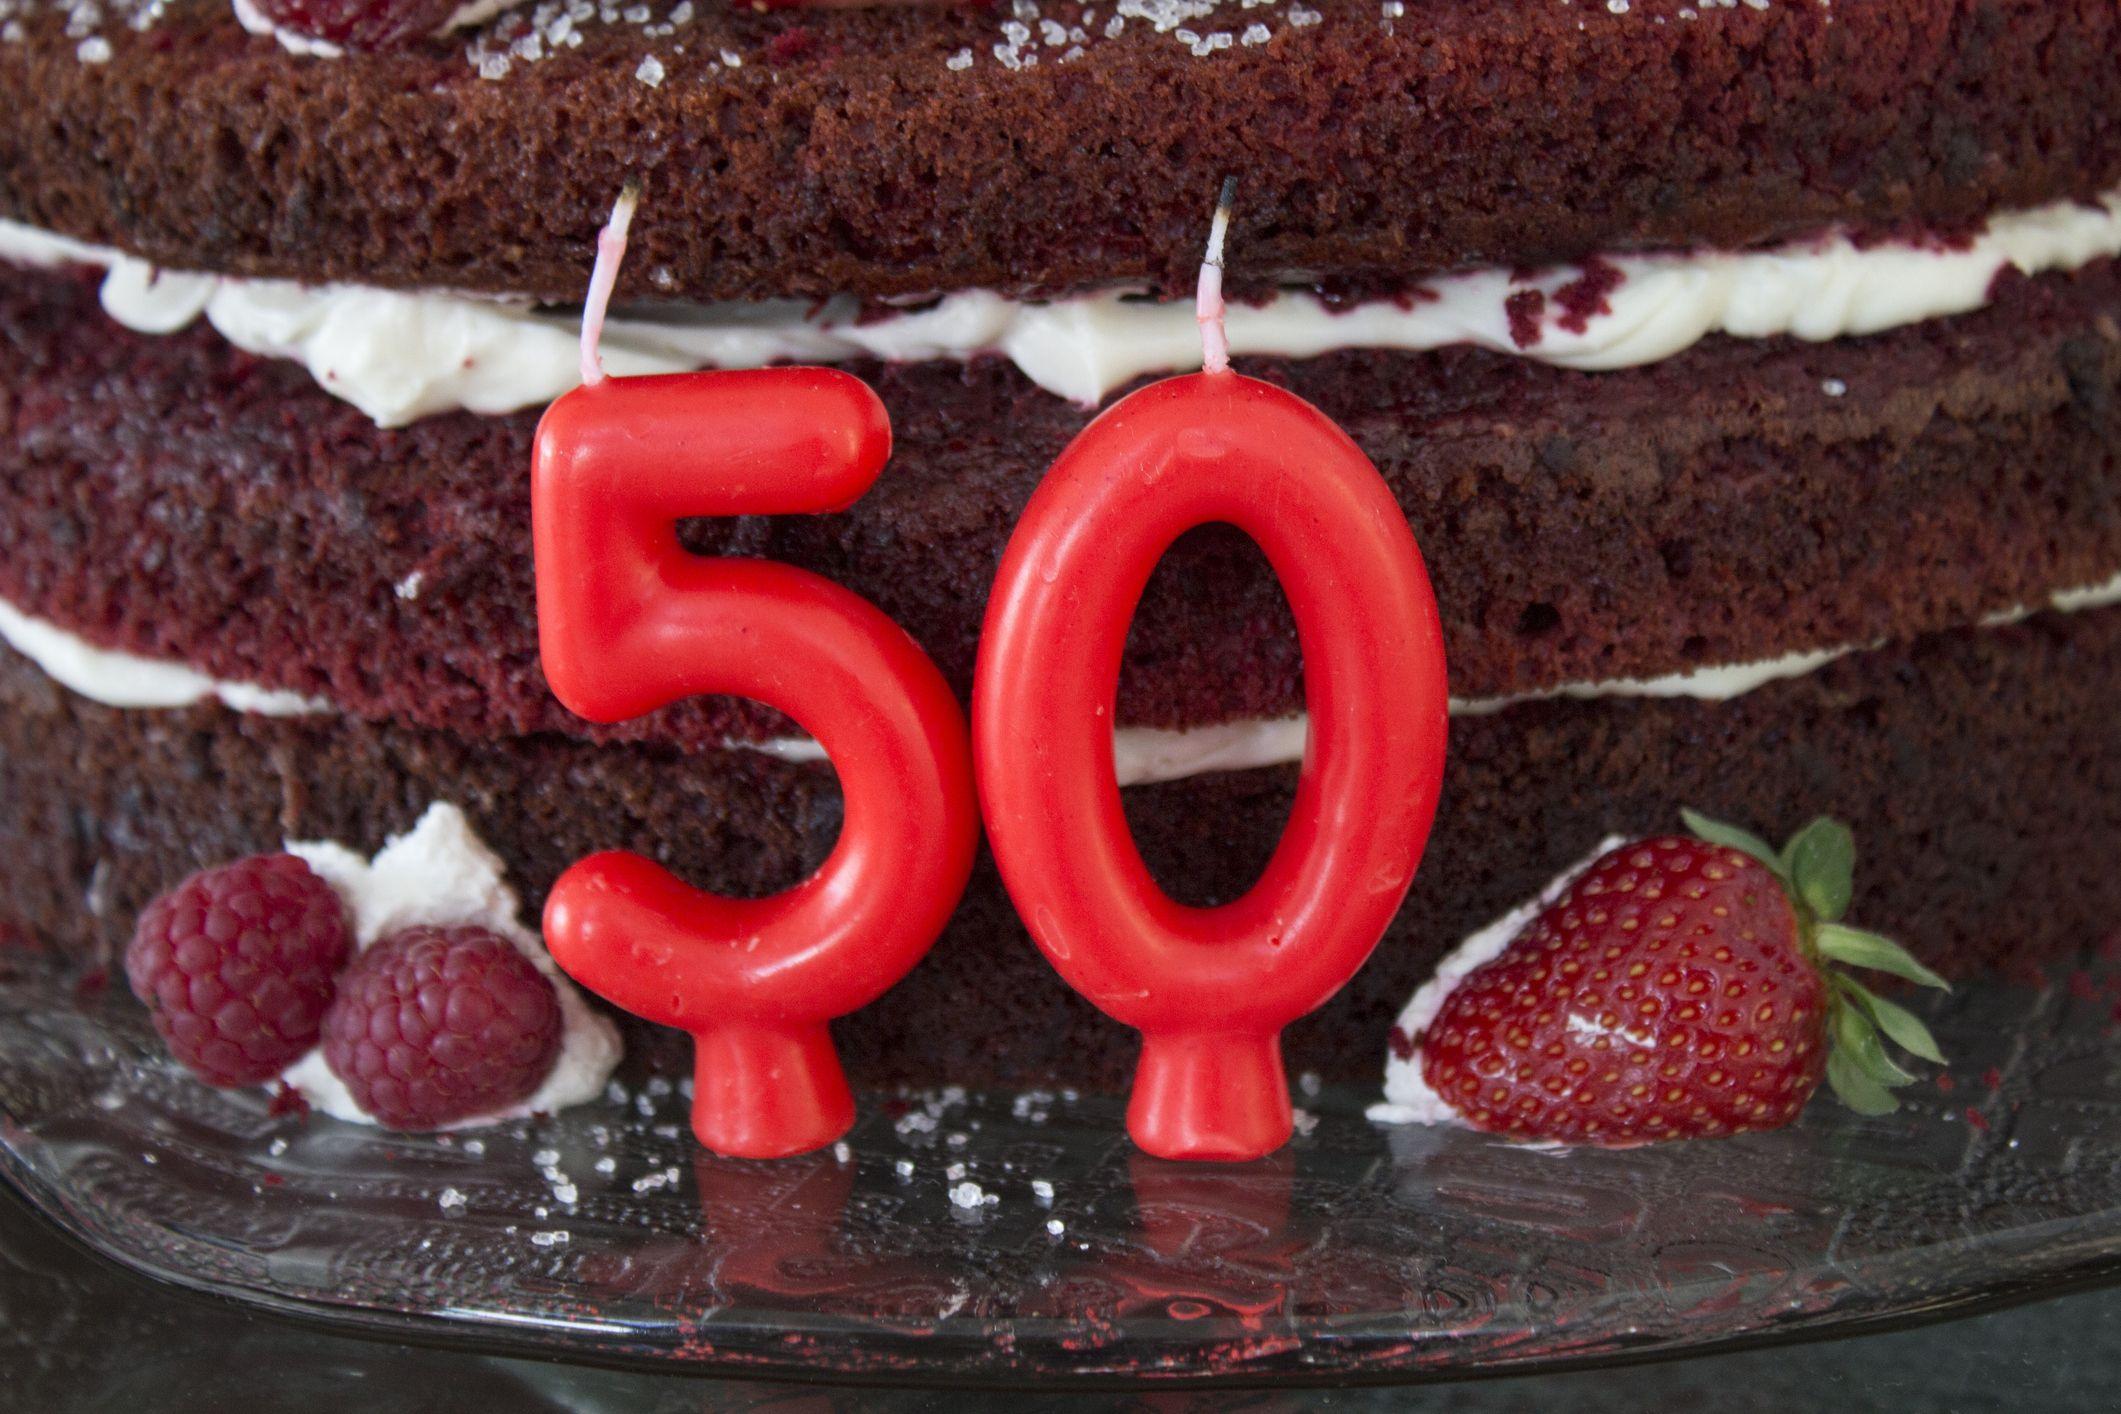 50th birthday trip ideas for men